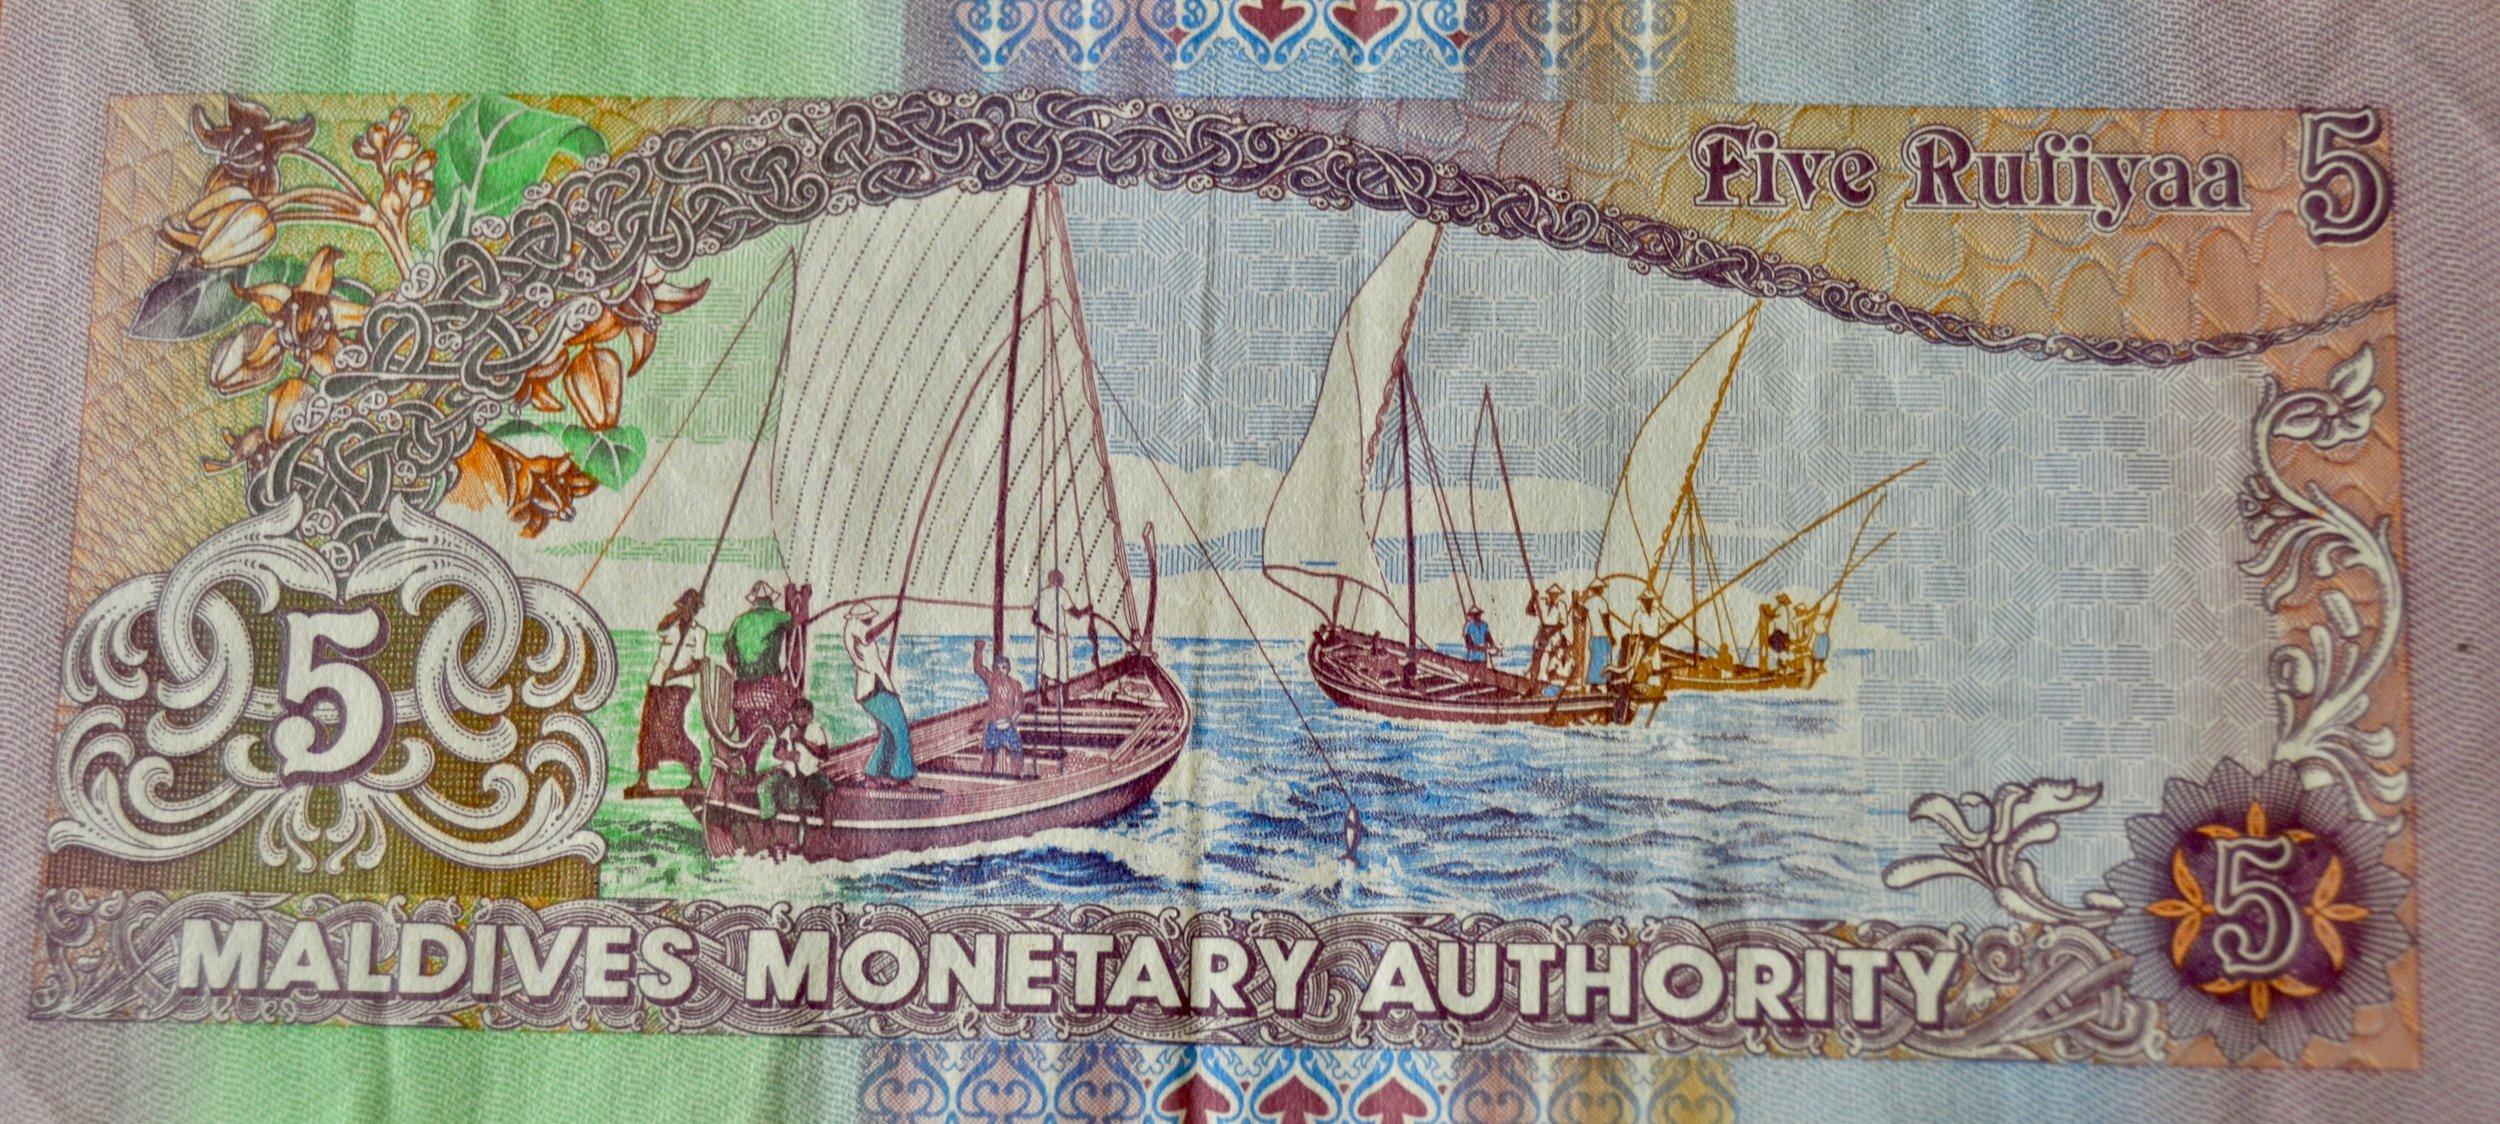 An old 5 Maldivian Rufiyaa banknote